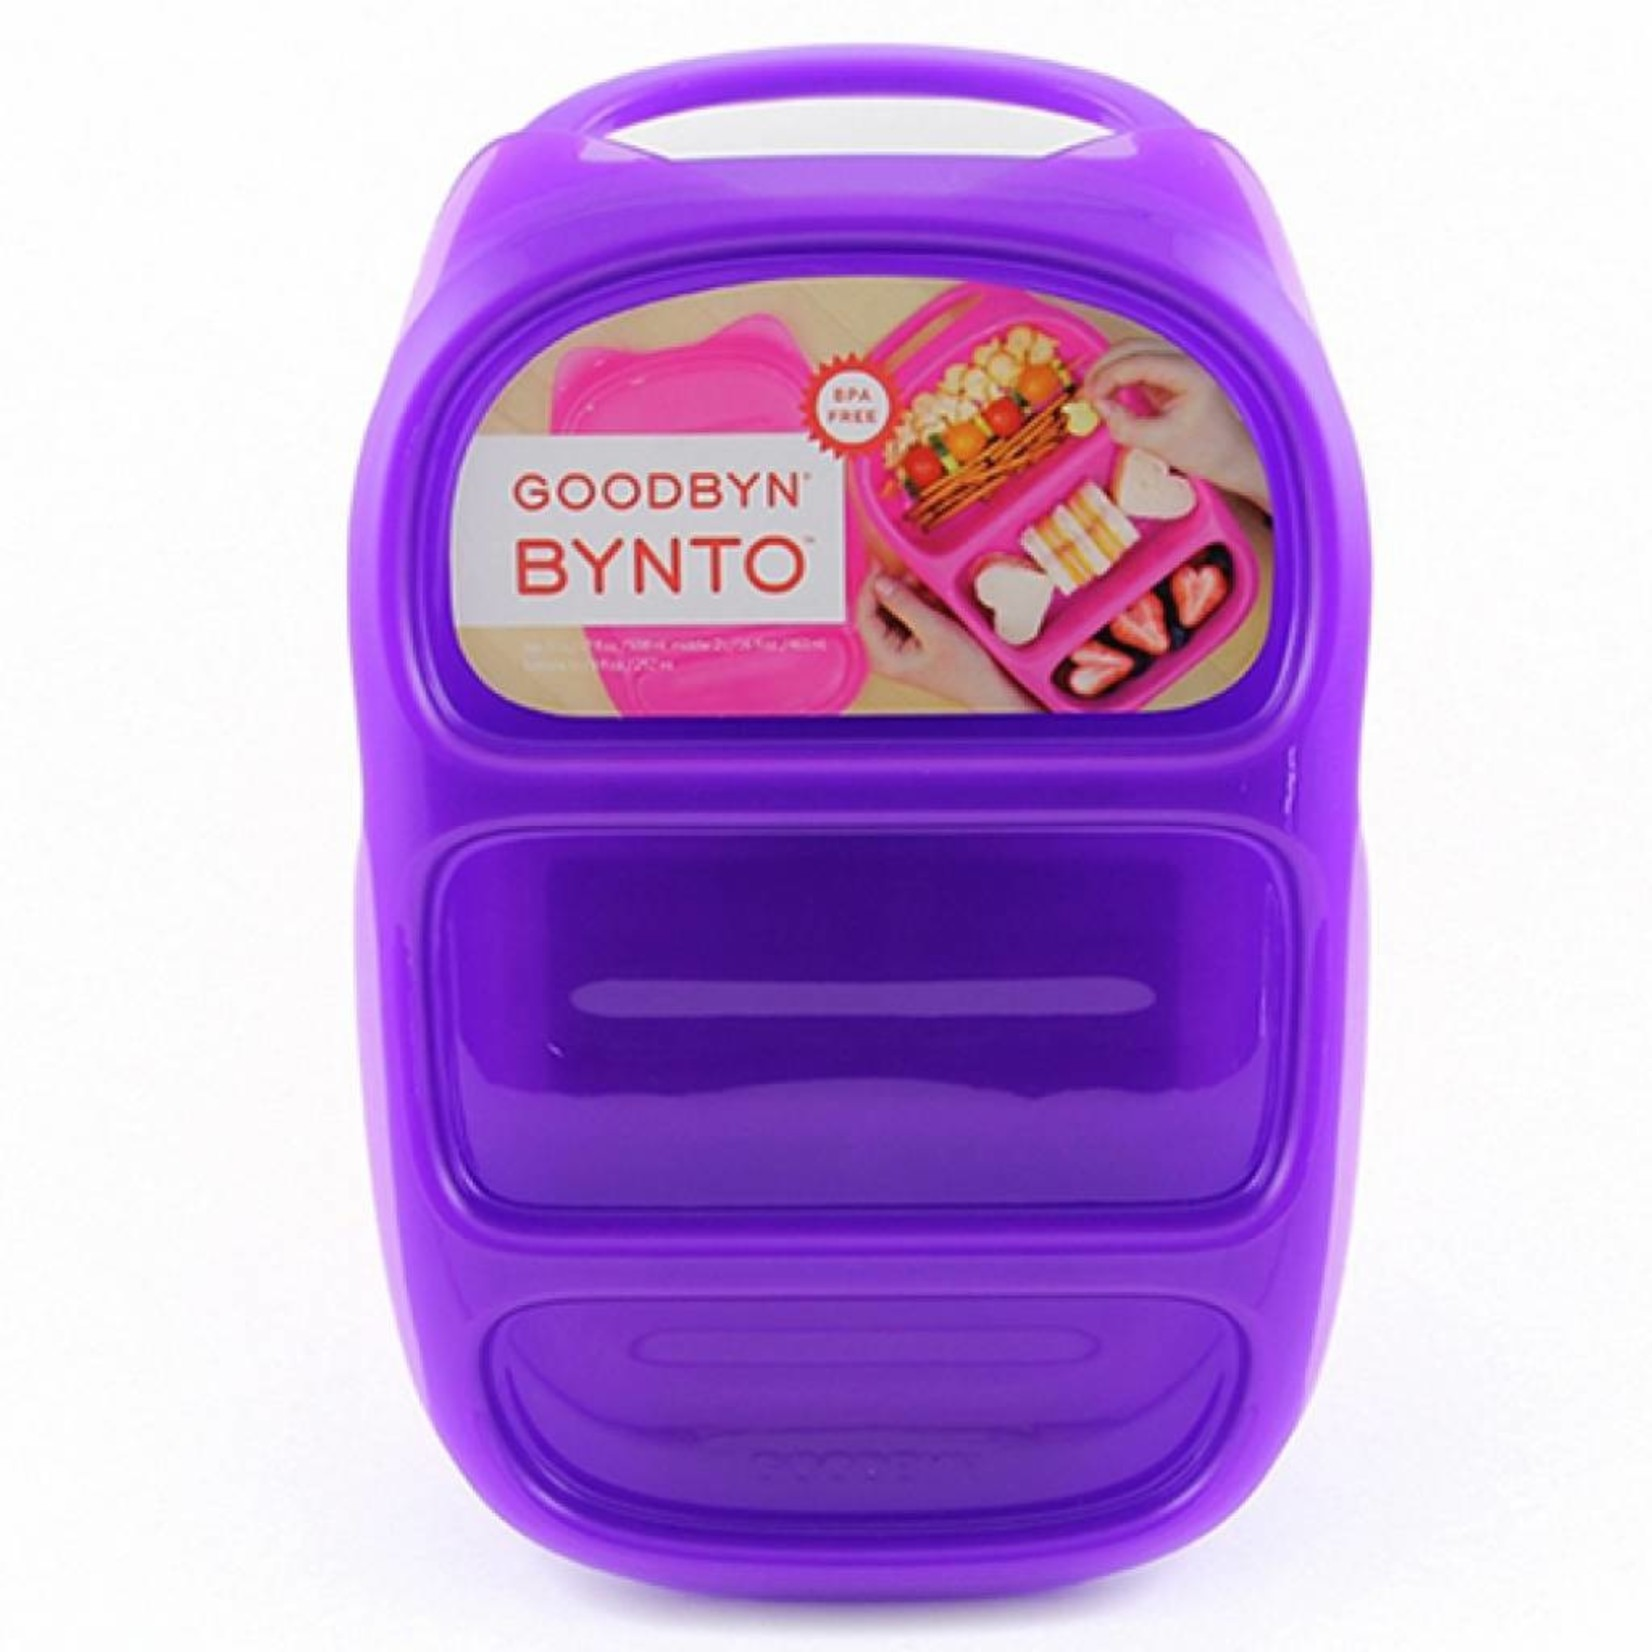 Goodbyn Bynto paars